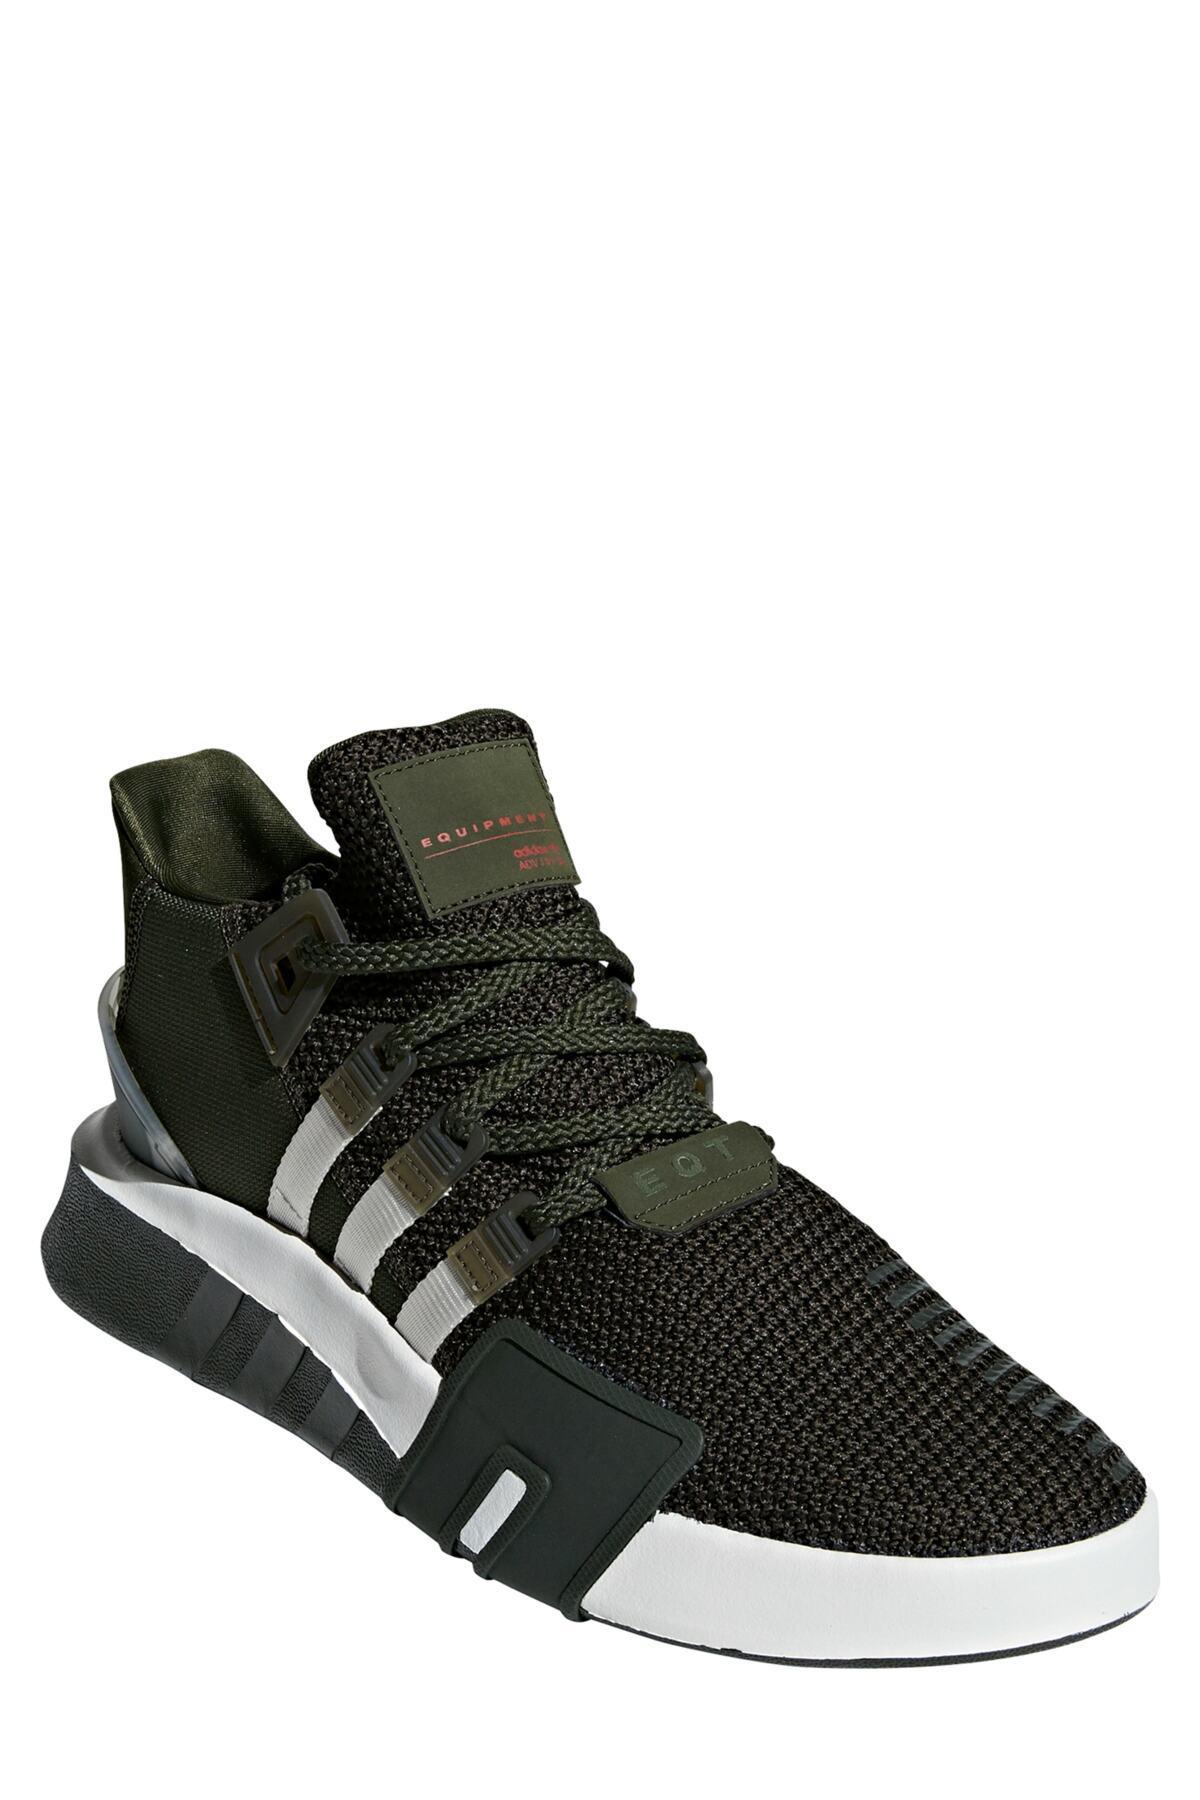 Lyst - adidas Eqt Basketball Adv Sneaker (men) in Black for Men a46a84c9c